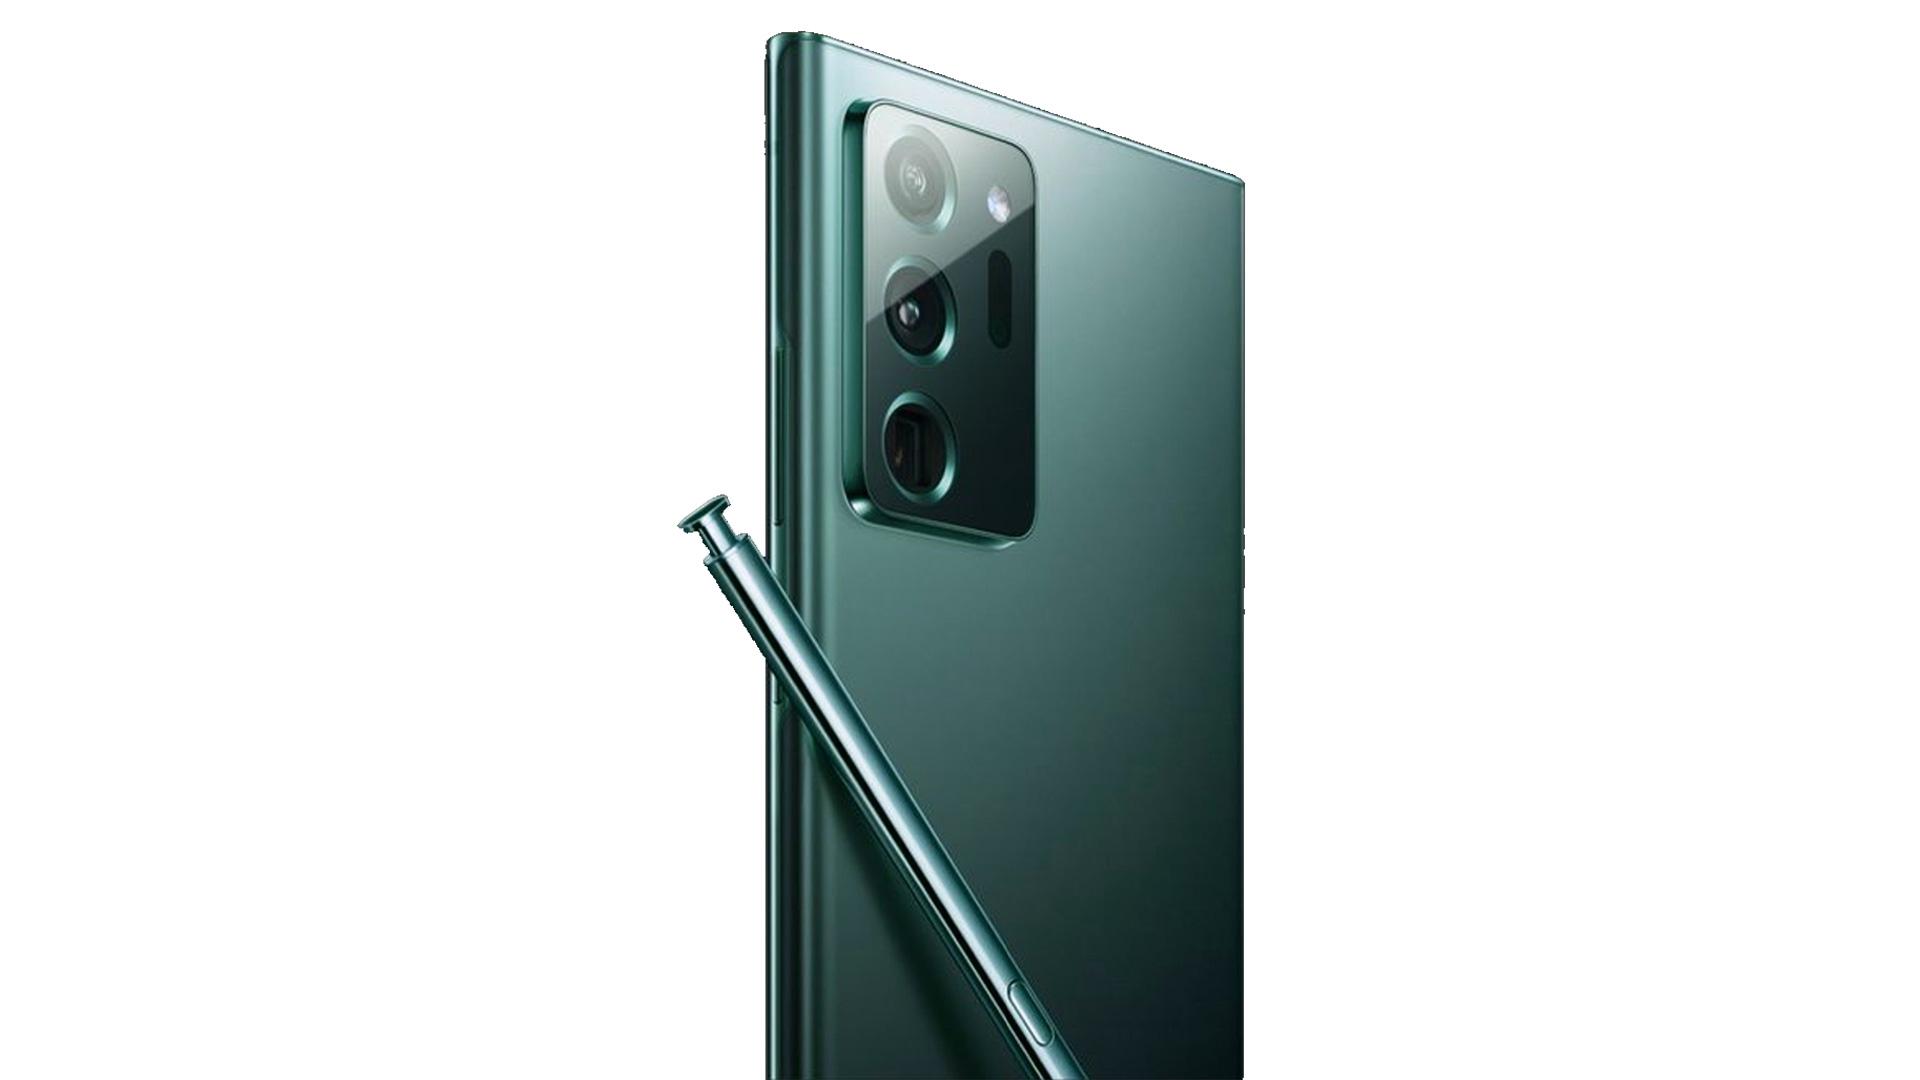 Un designer immagina Samsung Galaxy Note 20 Ultra in queste